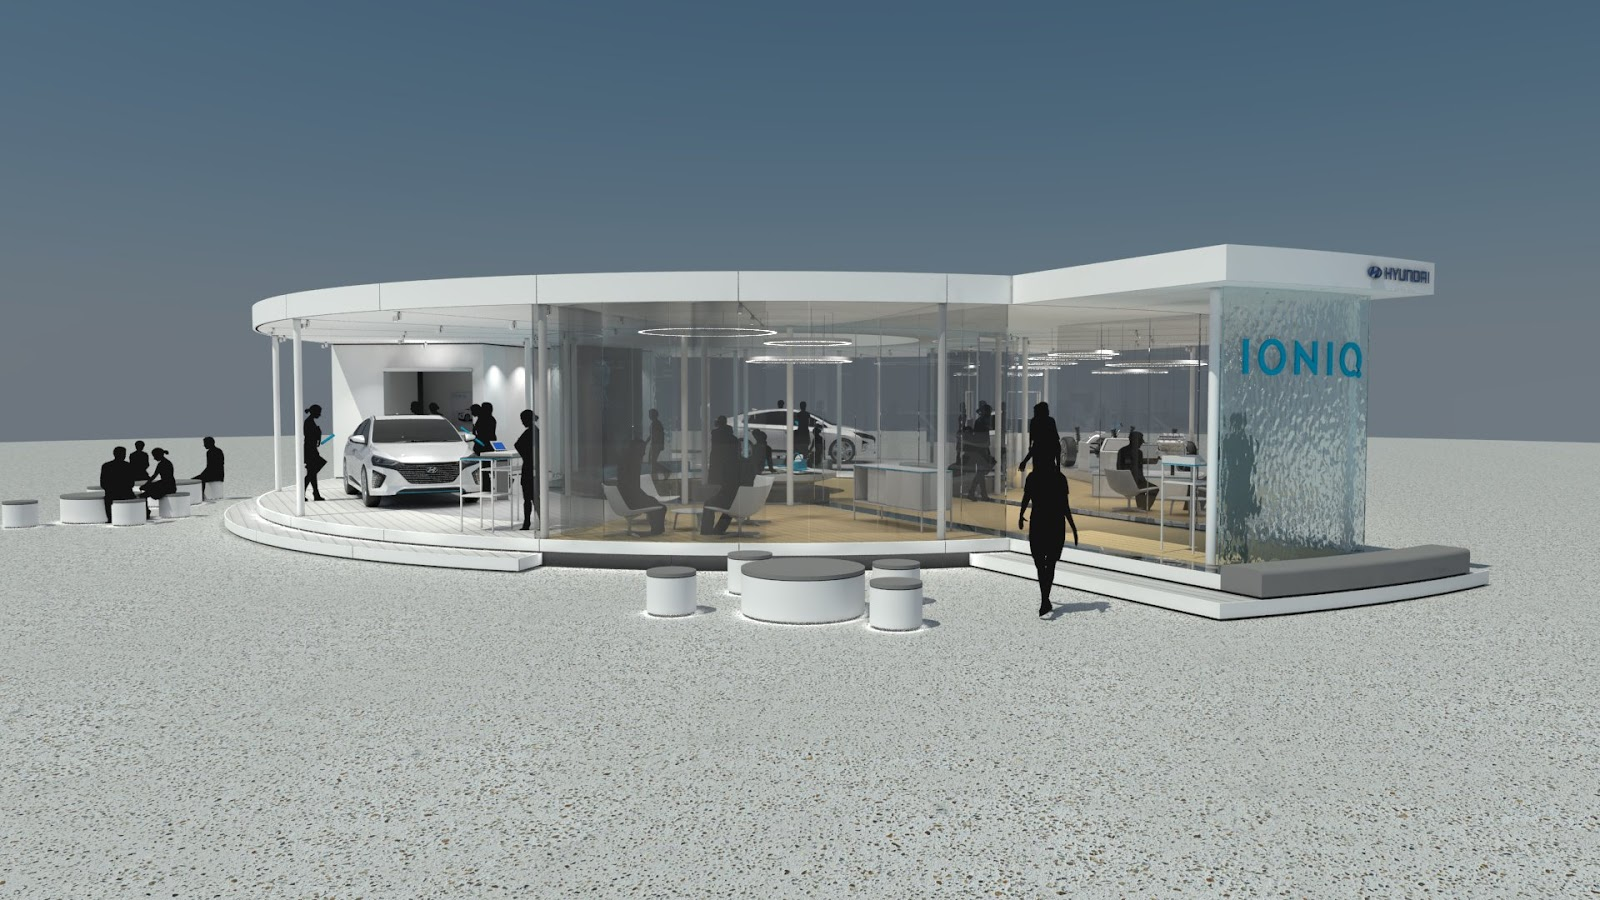 generation ioniq lounge H Hyundai Motor εγκαινιάζει το Generation IONIQ Tour στη Γερμανία car, Electric cars, Hyundai, Hyundai IONIQ, Hyundai Ελλάς